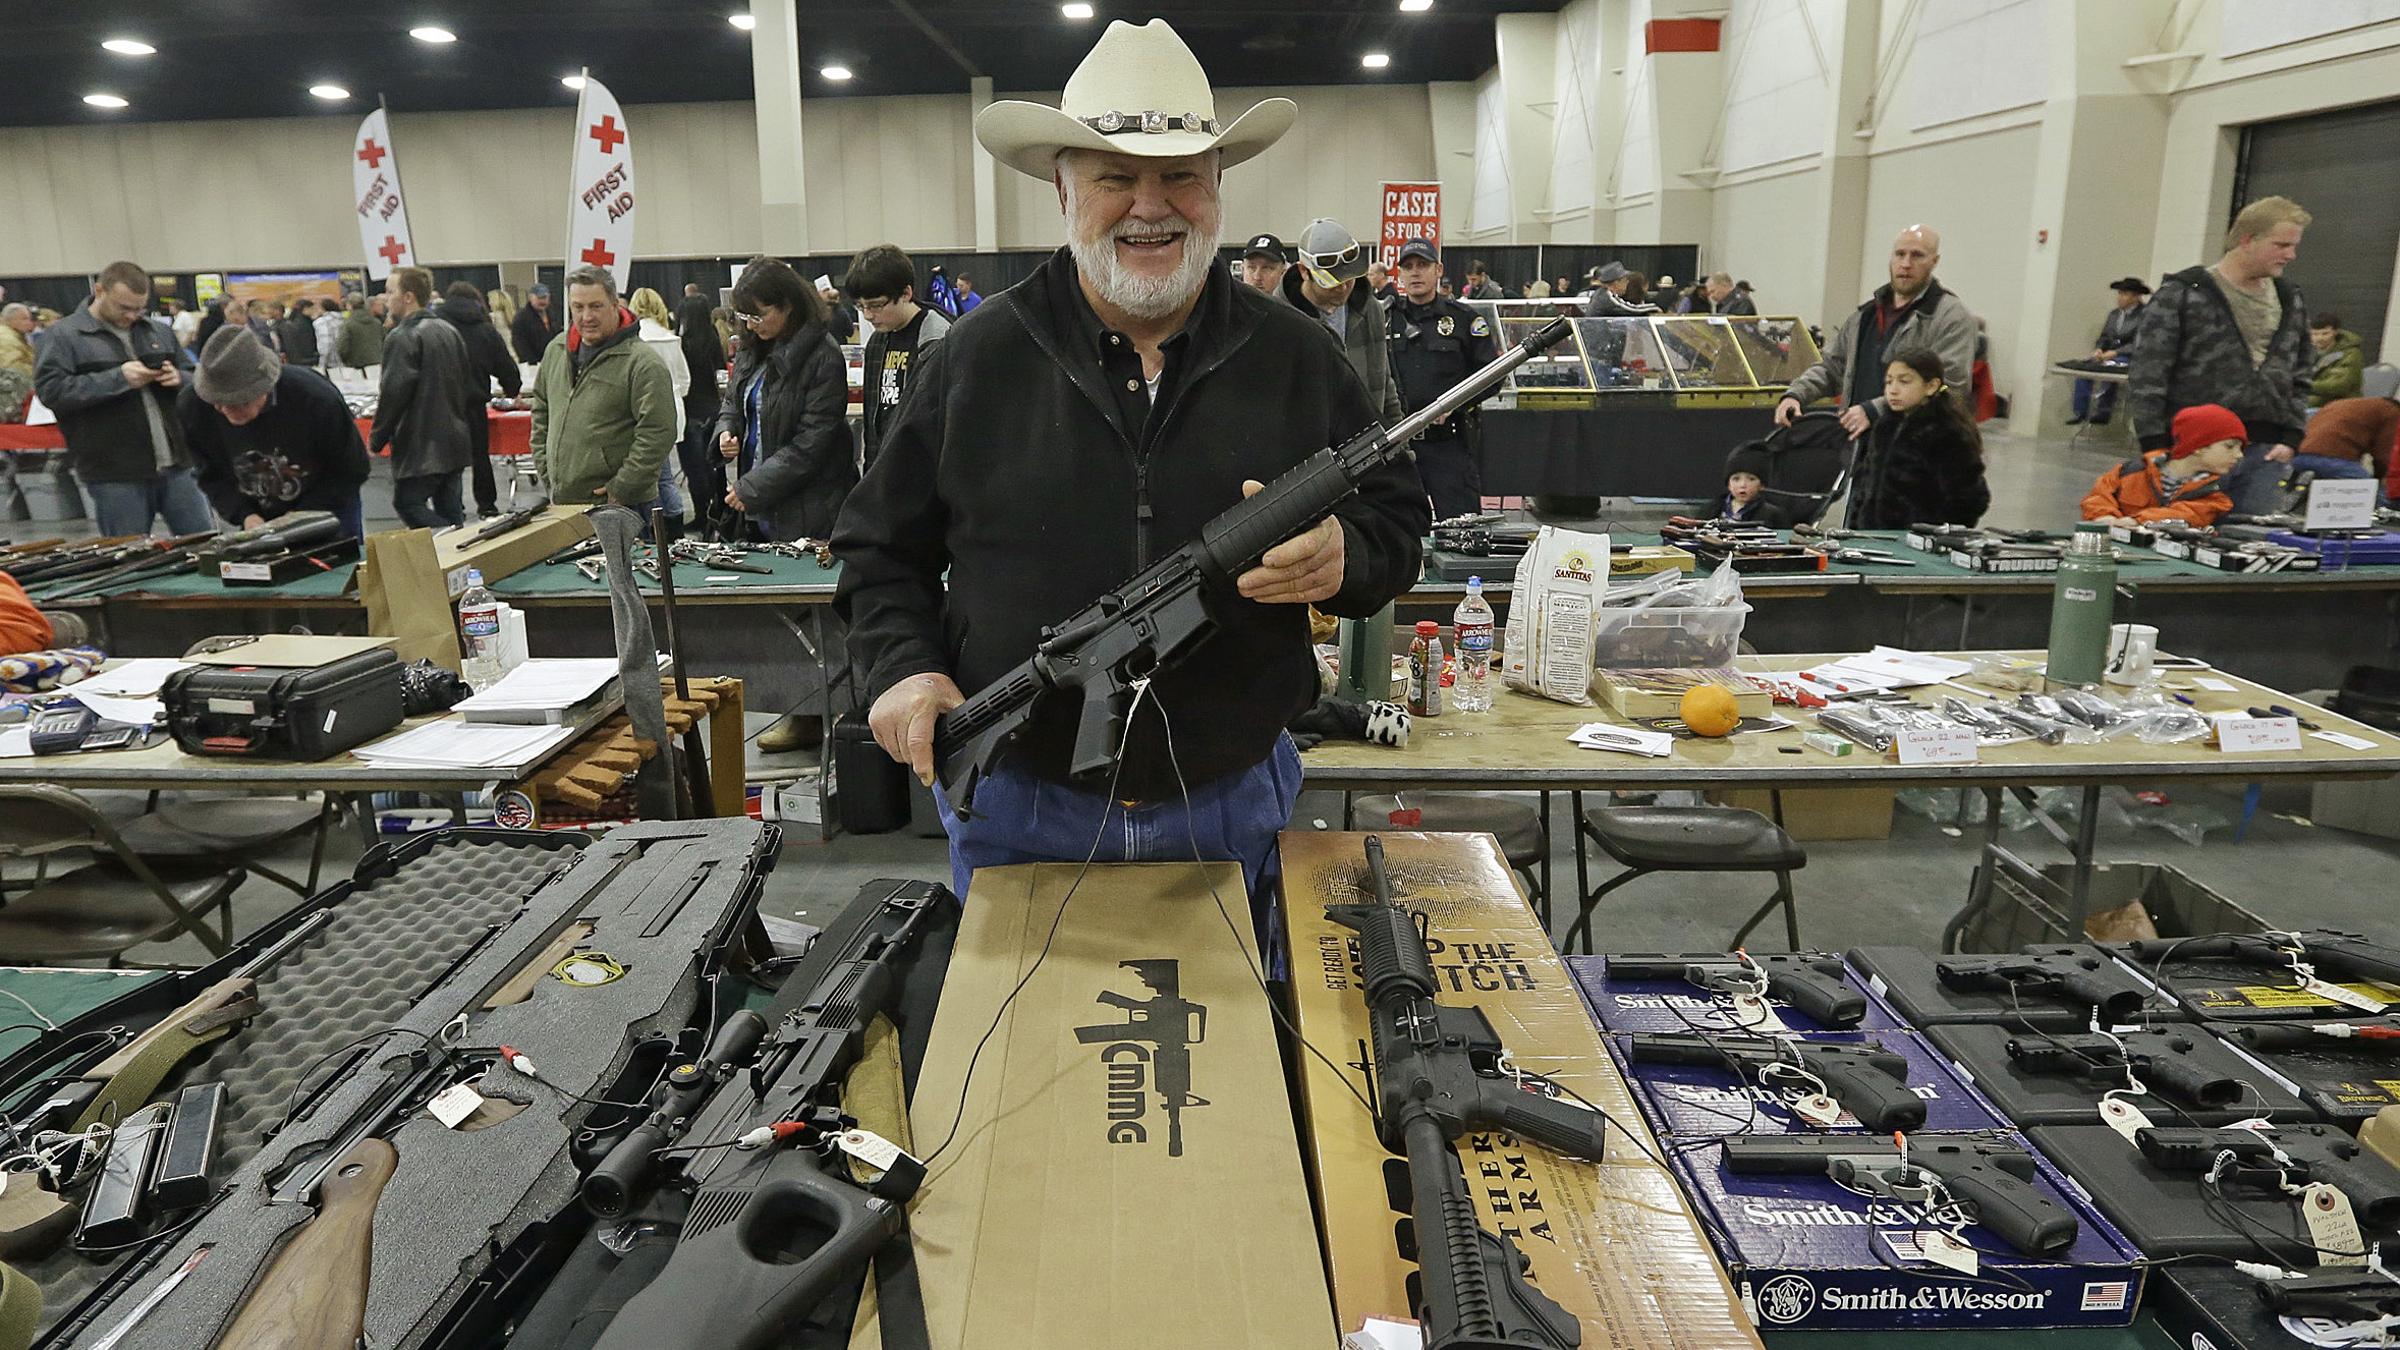 Ken Haiterman, of Pioneer Market, holds a CMMG 5.56mm AR 15 during the 2013 Rocky Mountain Gun Show Sunday, Jan. 6, 2013, in Sandy, Utah.